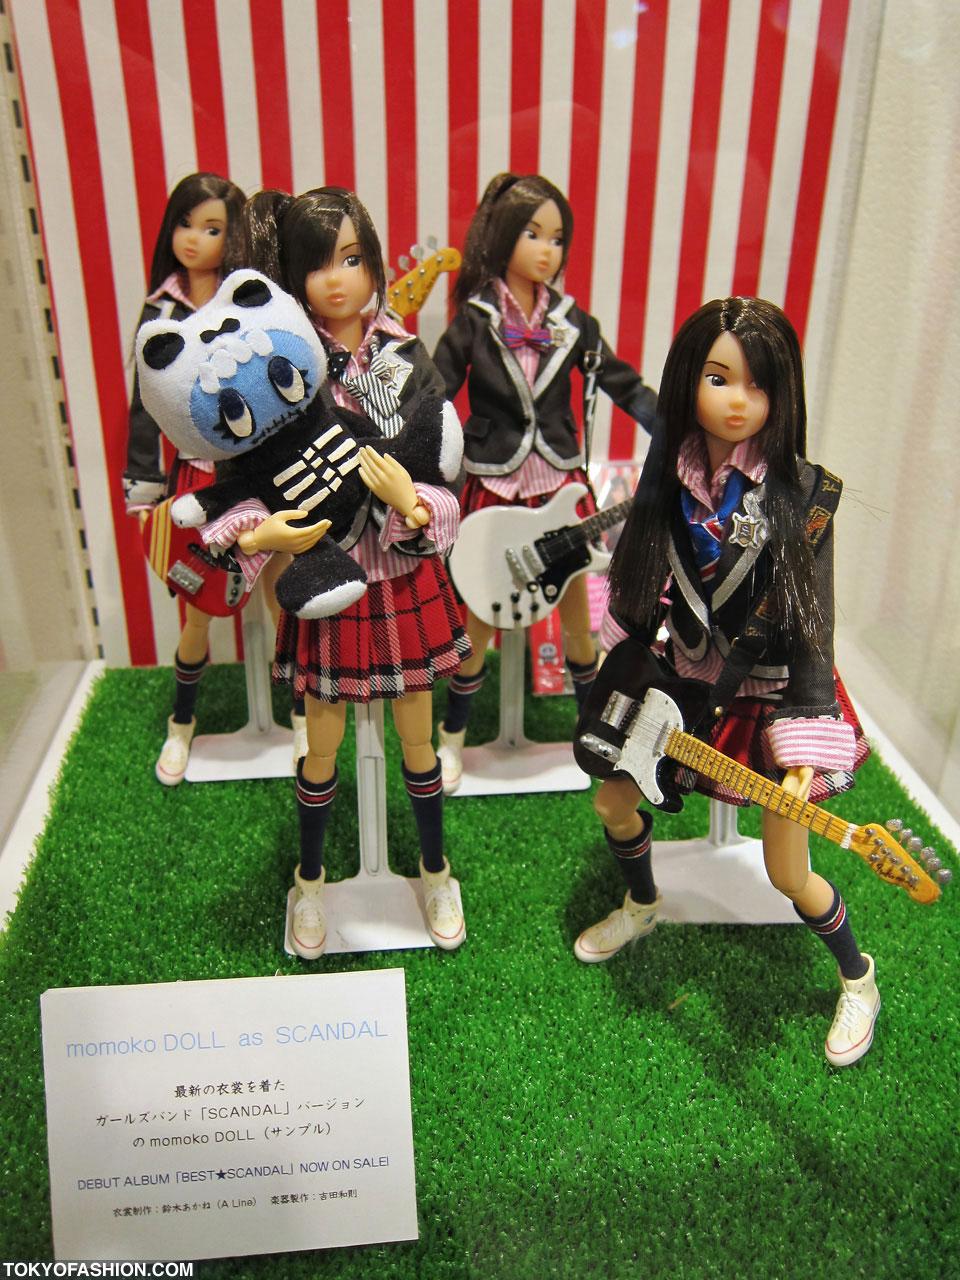 Band dolls / Breakfast in bismarck nd